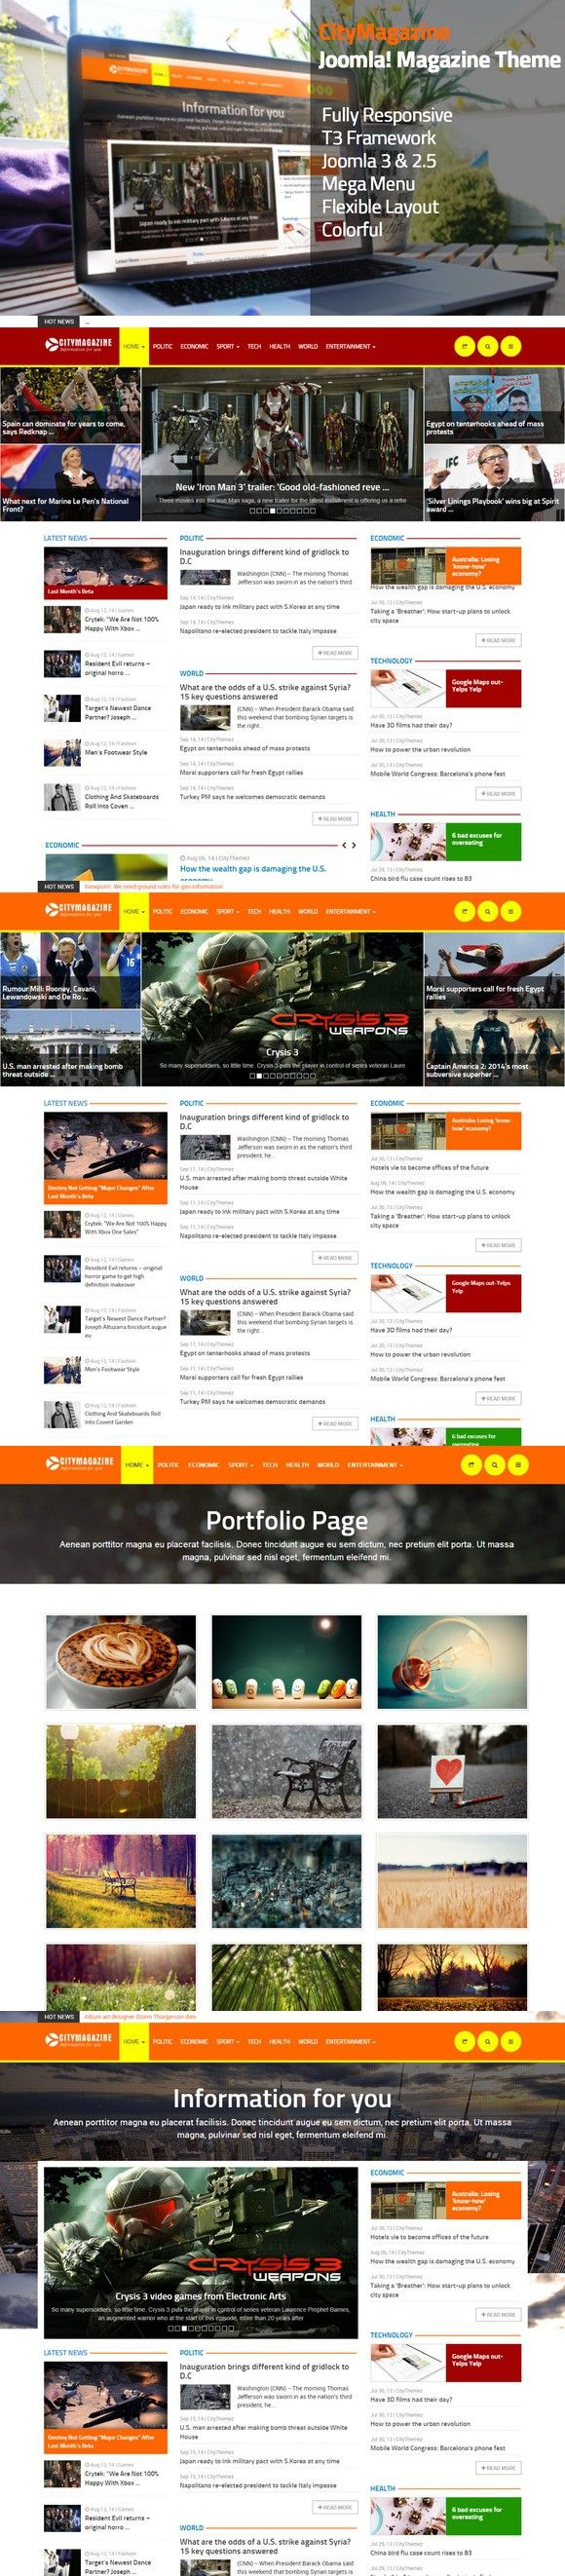 CityMagazine - Joomla Magazine Theme. Joomla Themes. $48.00